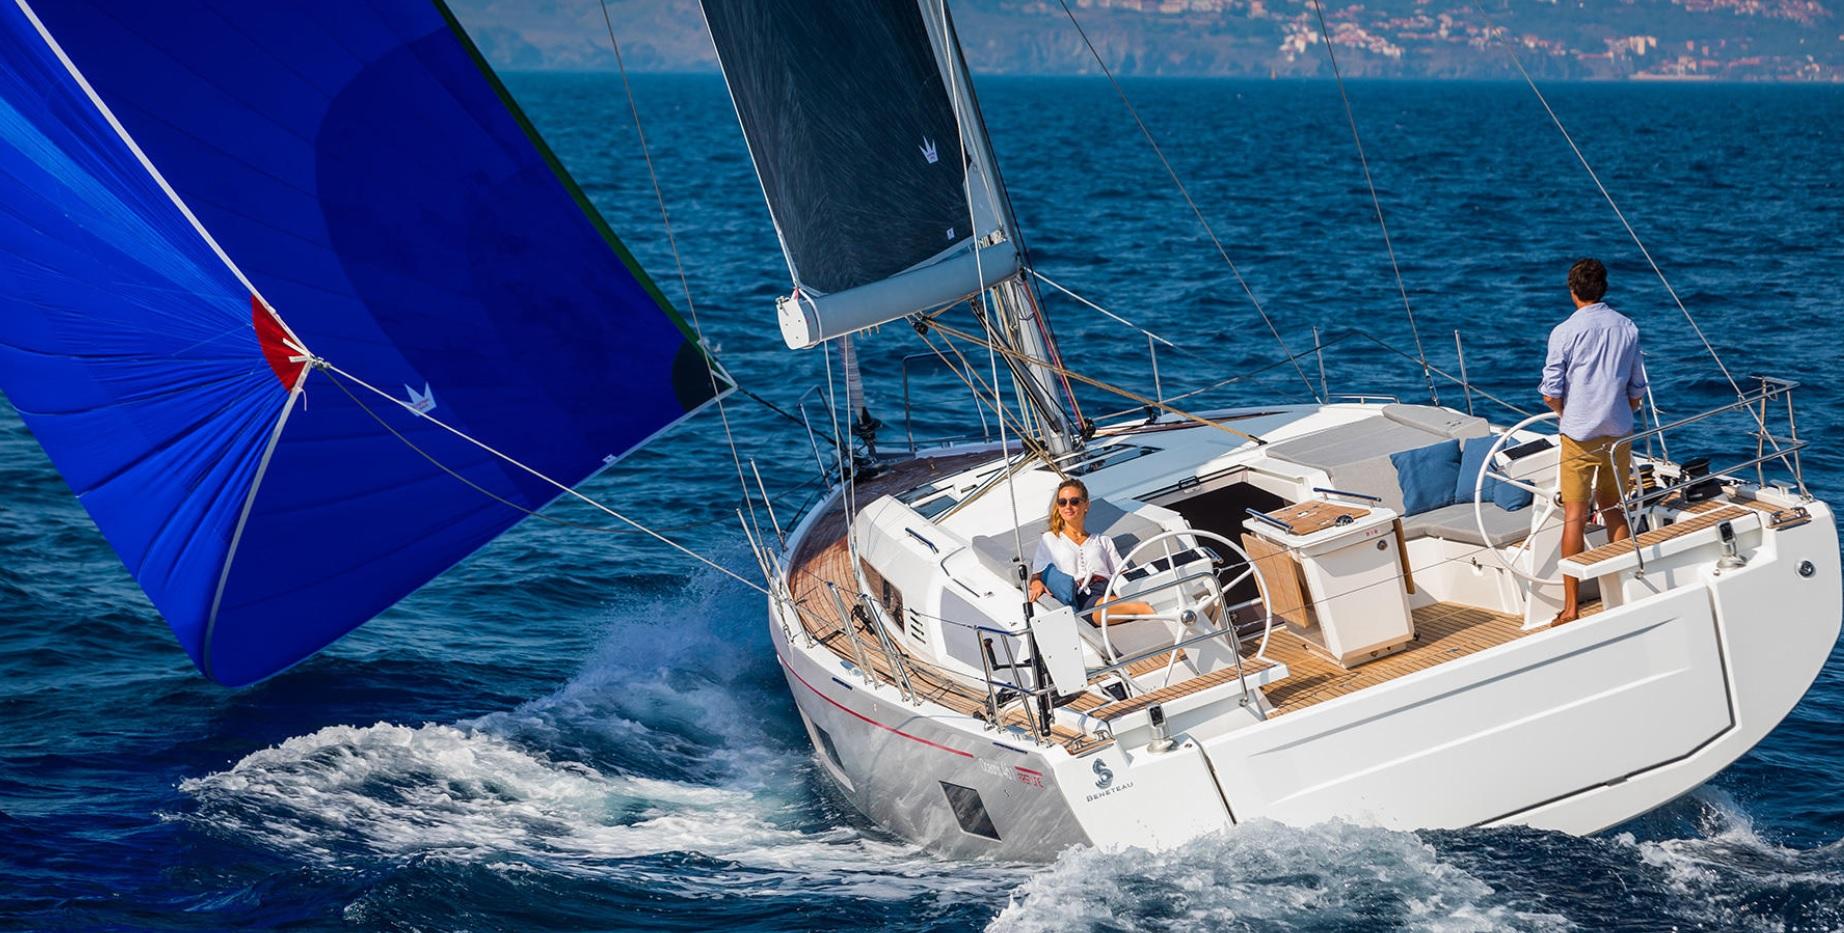 beneteau-oceanis-46-1-sailing-yacht-charter